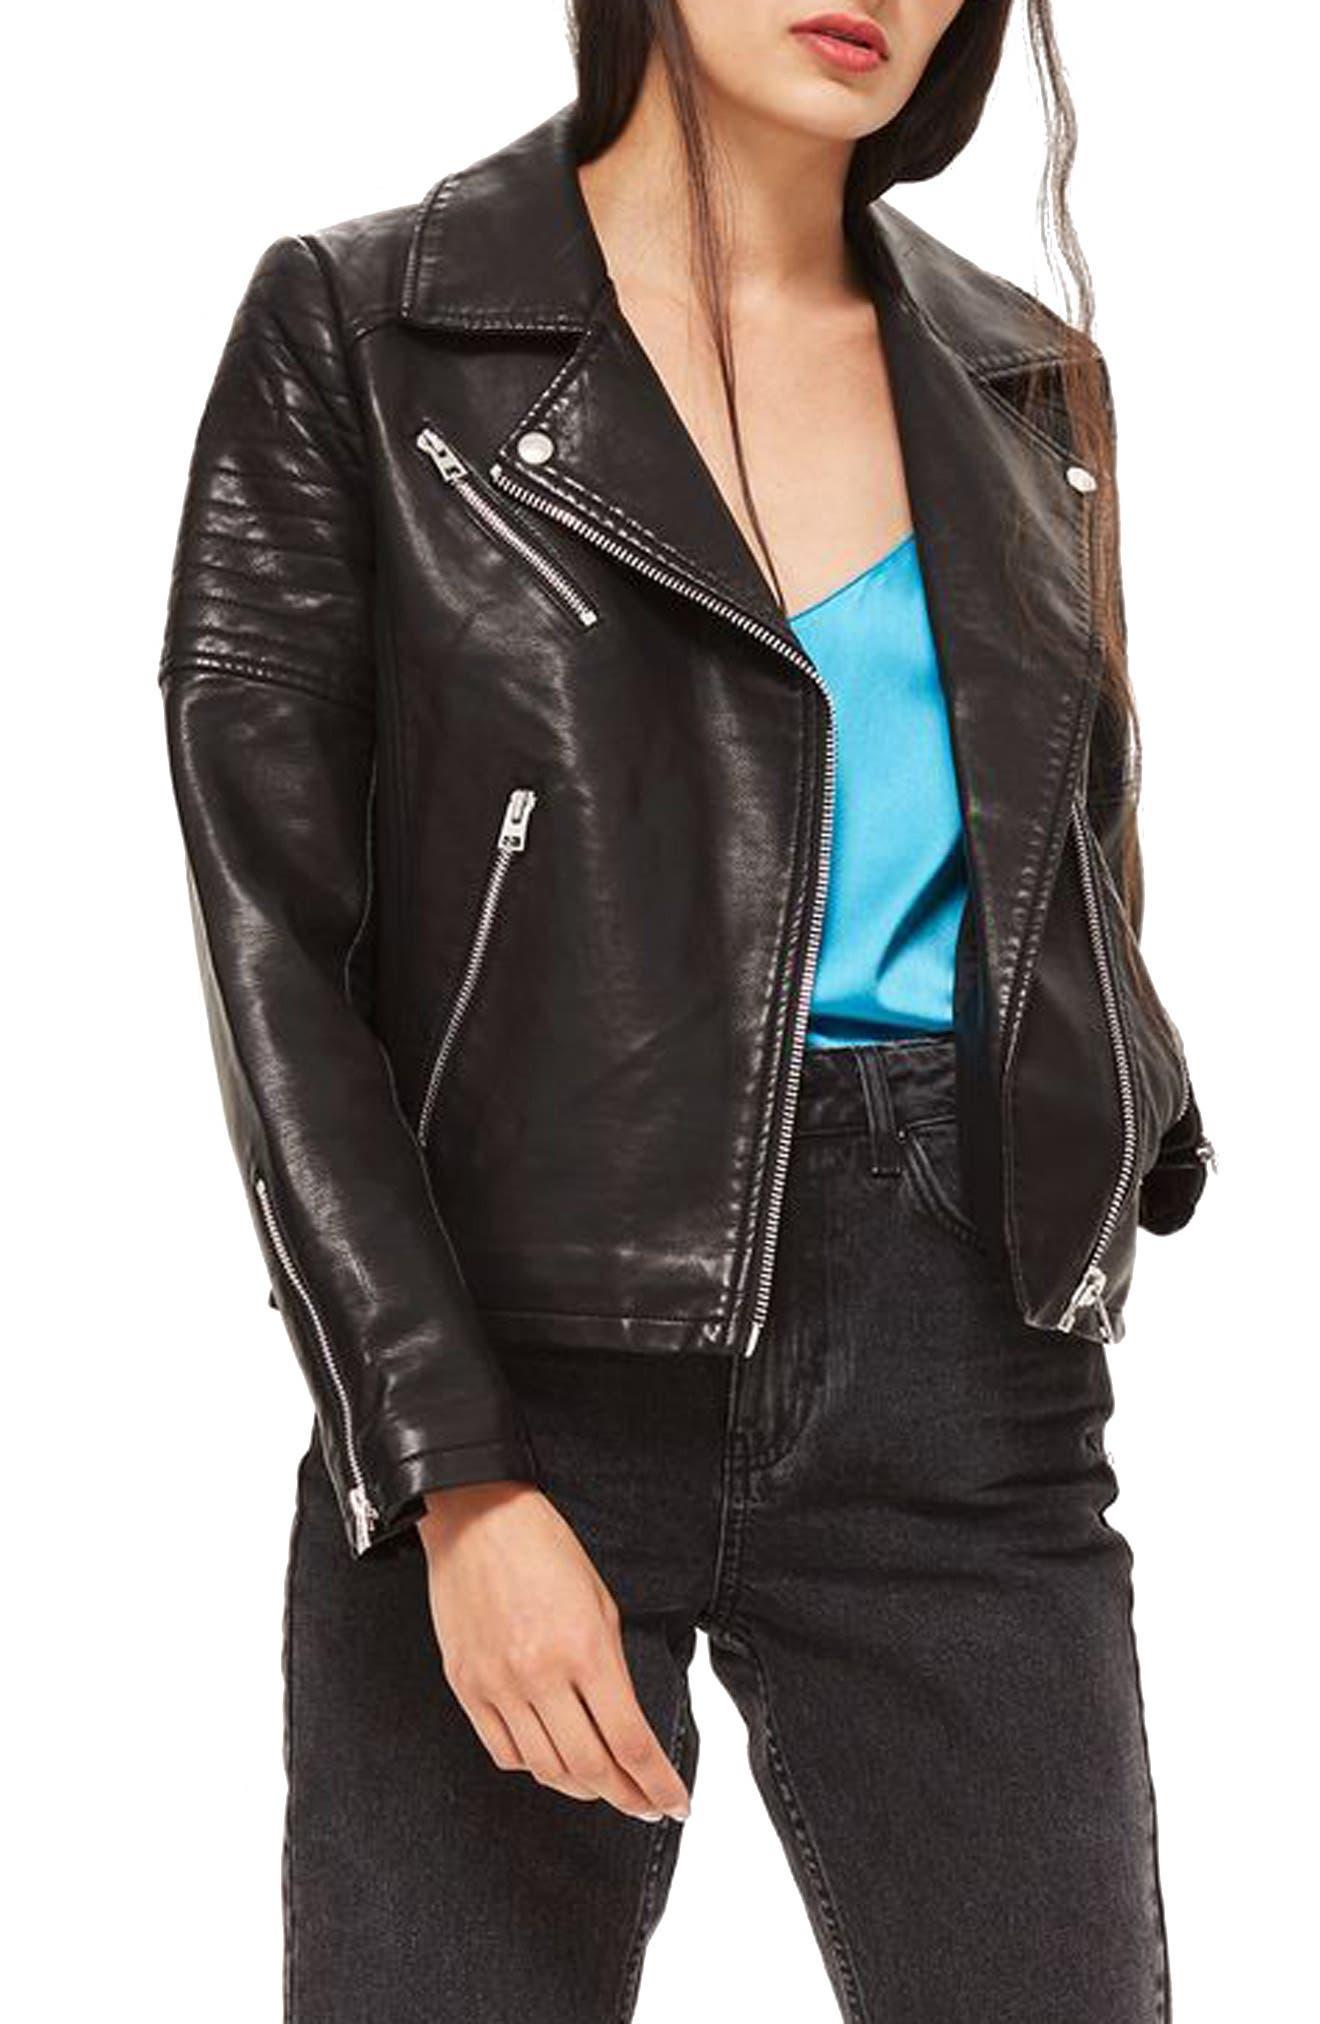 TOPSHOP, Blossom Faux Leather Biker Jacket, Main thumbnail 1, color, 001